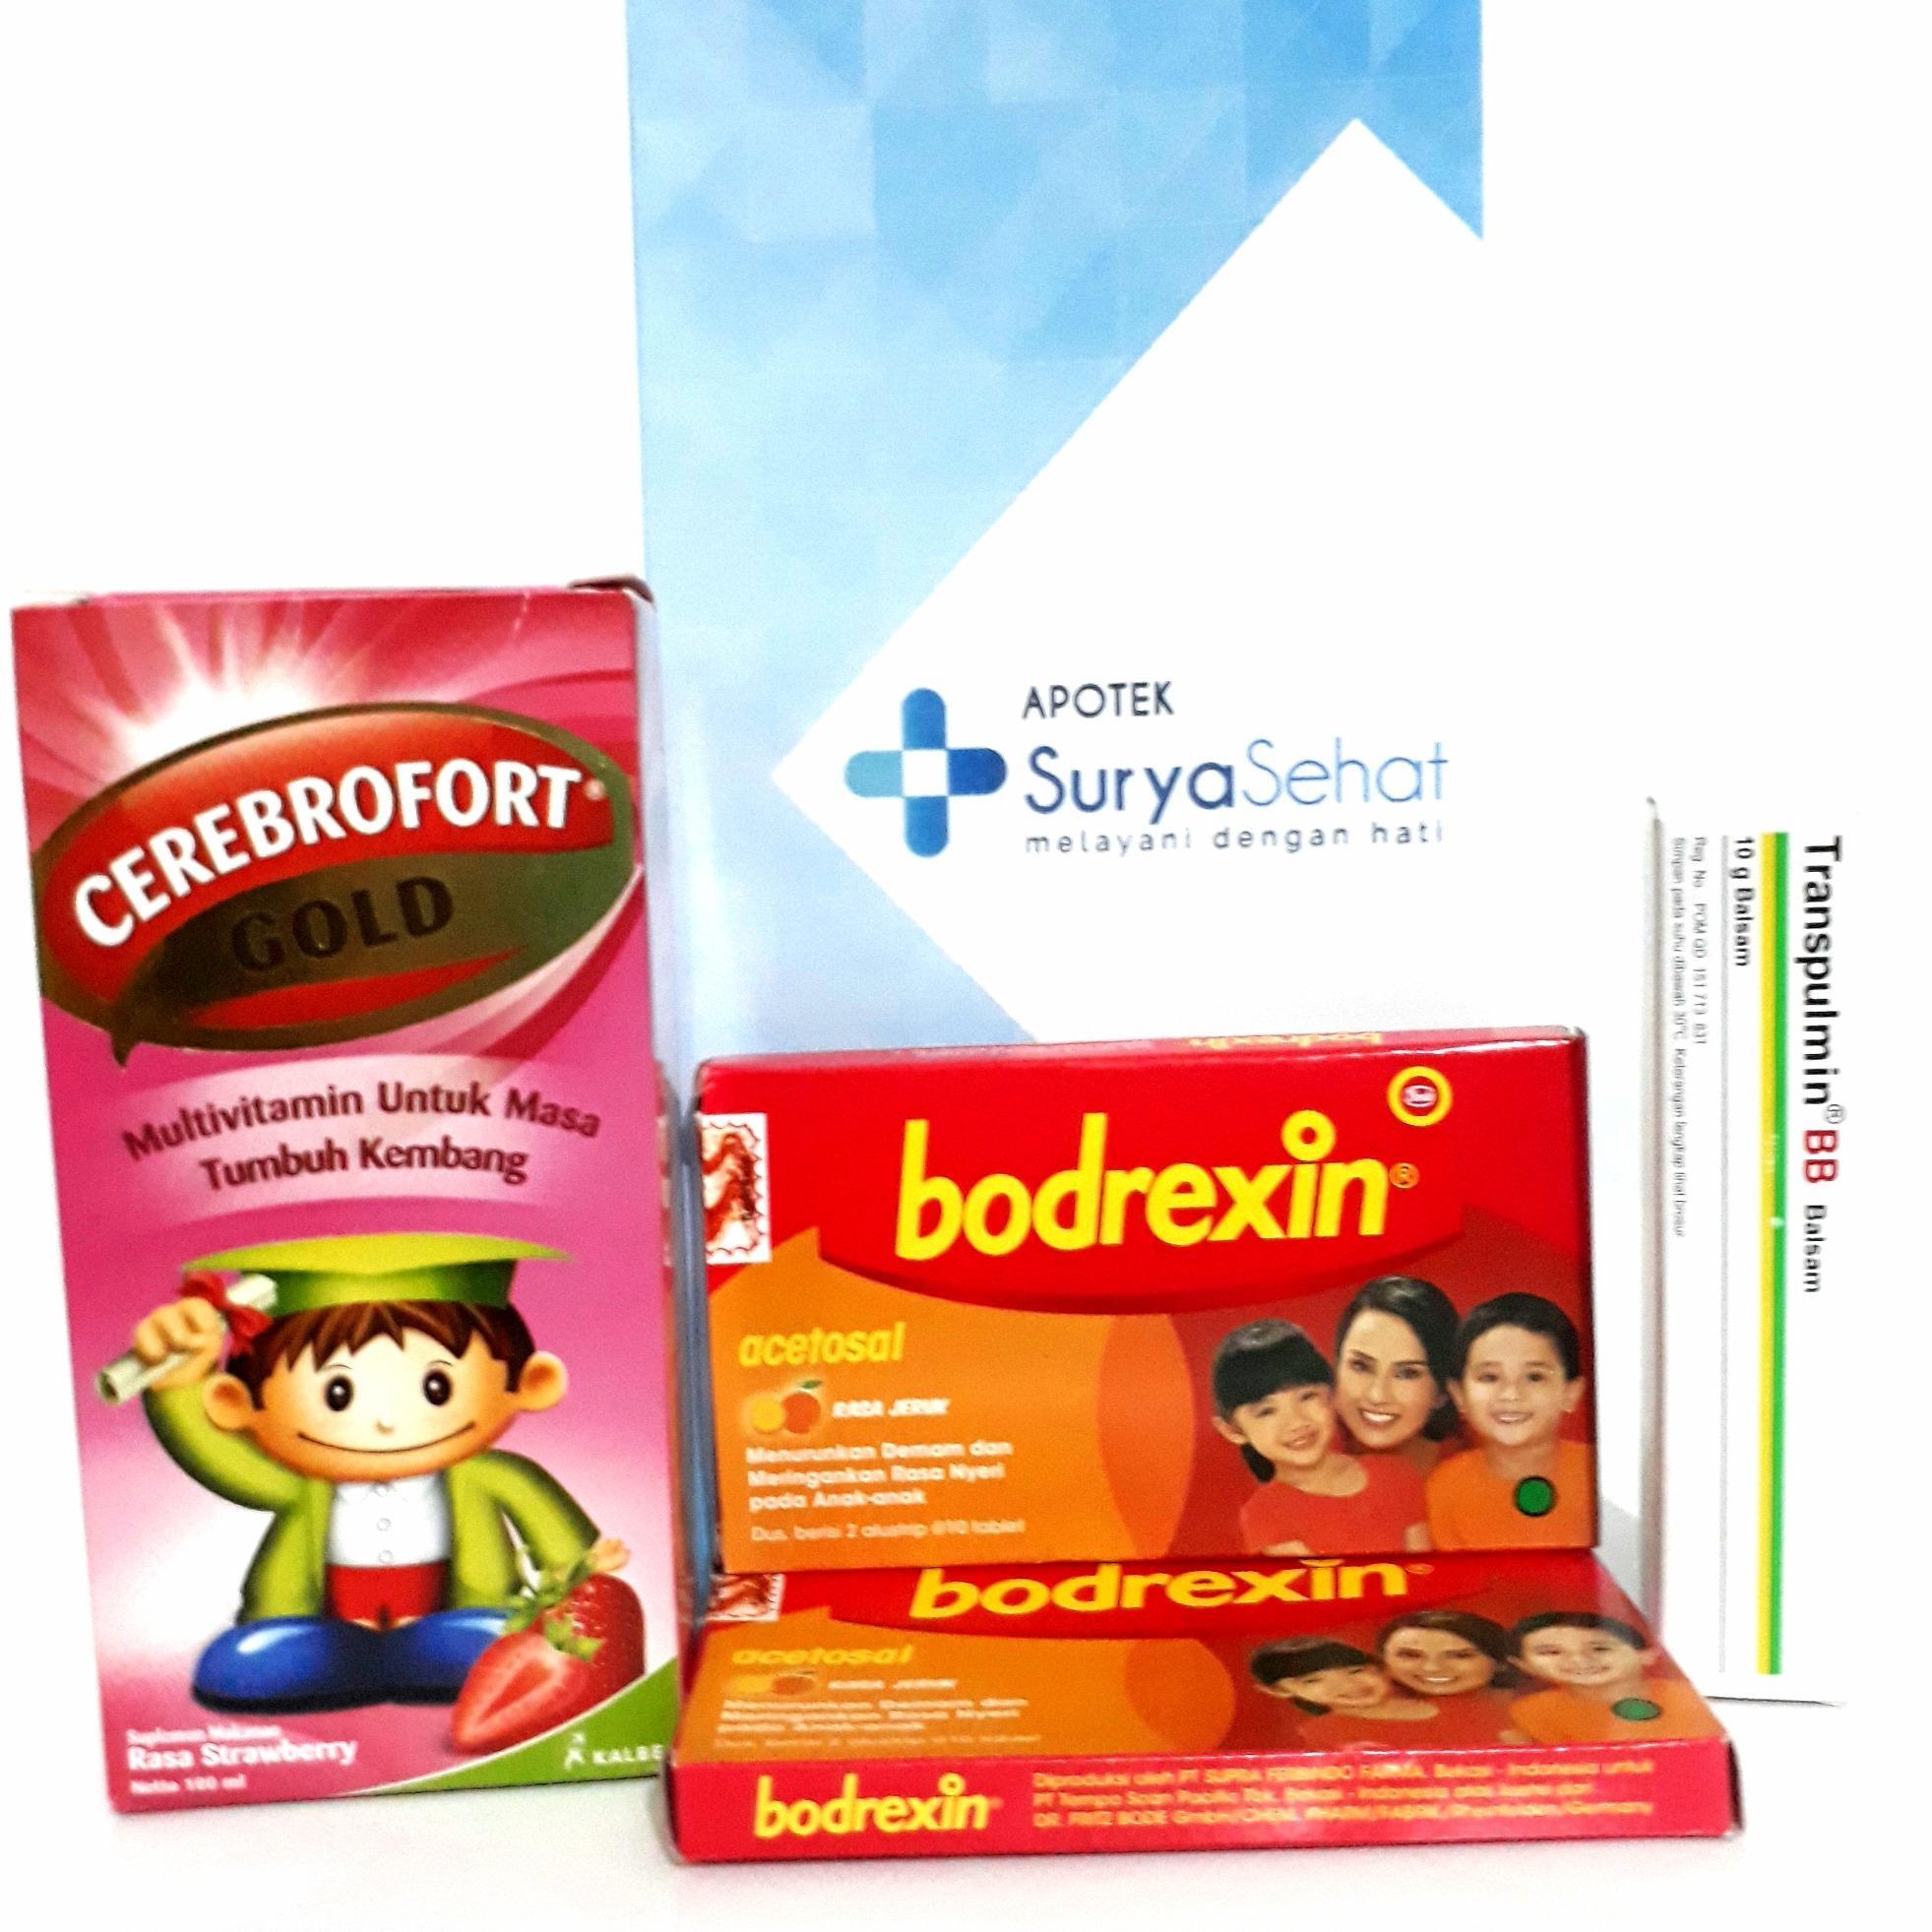 Paket Hemat Obat dan Vitamin Anak Bodrexin 4 Strip Transpulmin BB 10g Cerebrofort